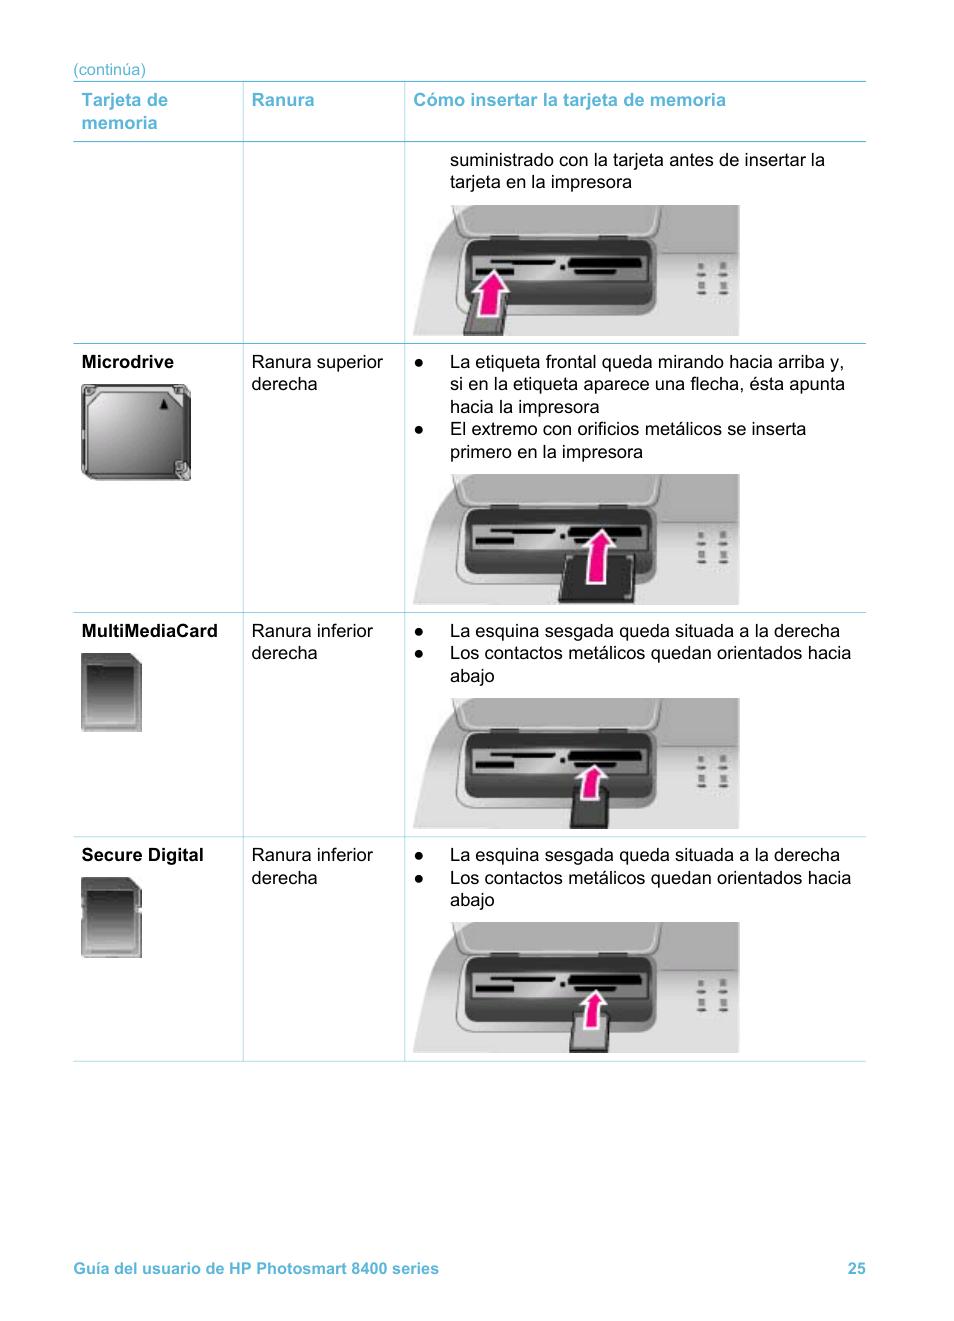 hp impresora fotogr fica hp photosmart 8450 manual del usuario rh pdfmanuales com hp photosmart 8450 user manual hp photosmart 8450 manual pdf